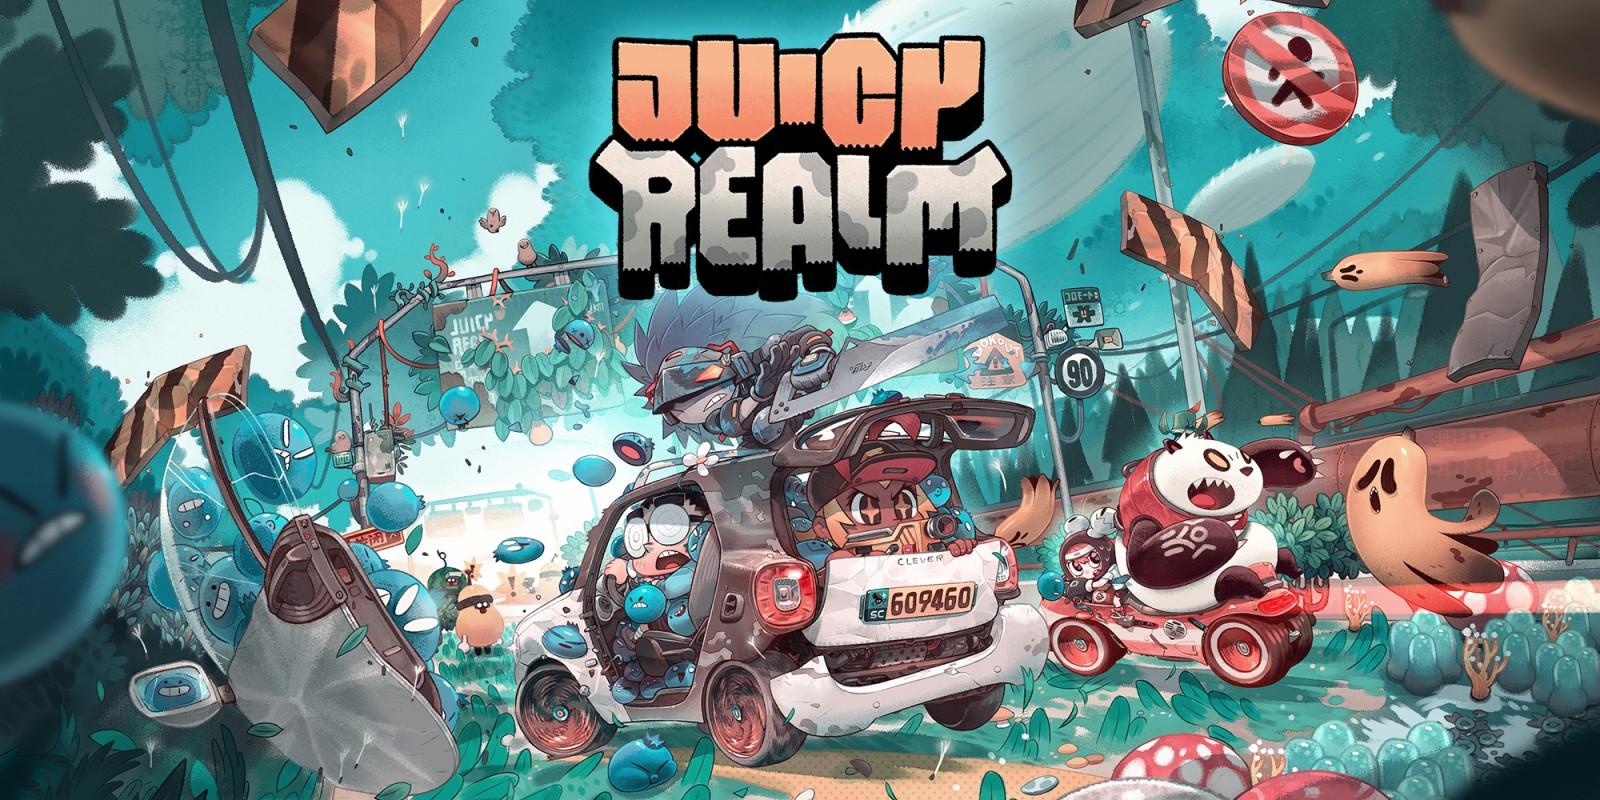 Juicy Realm เกมตะลุยด่านสุดกวนกำลังมาเปิดให้เล่นบน Mobile - GameMonday